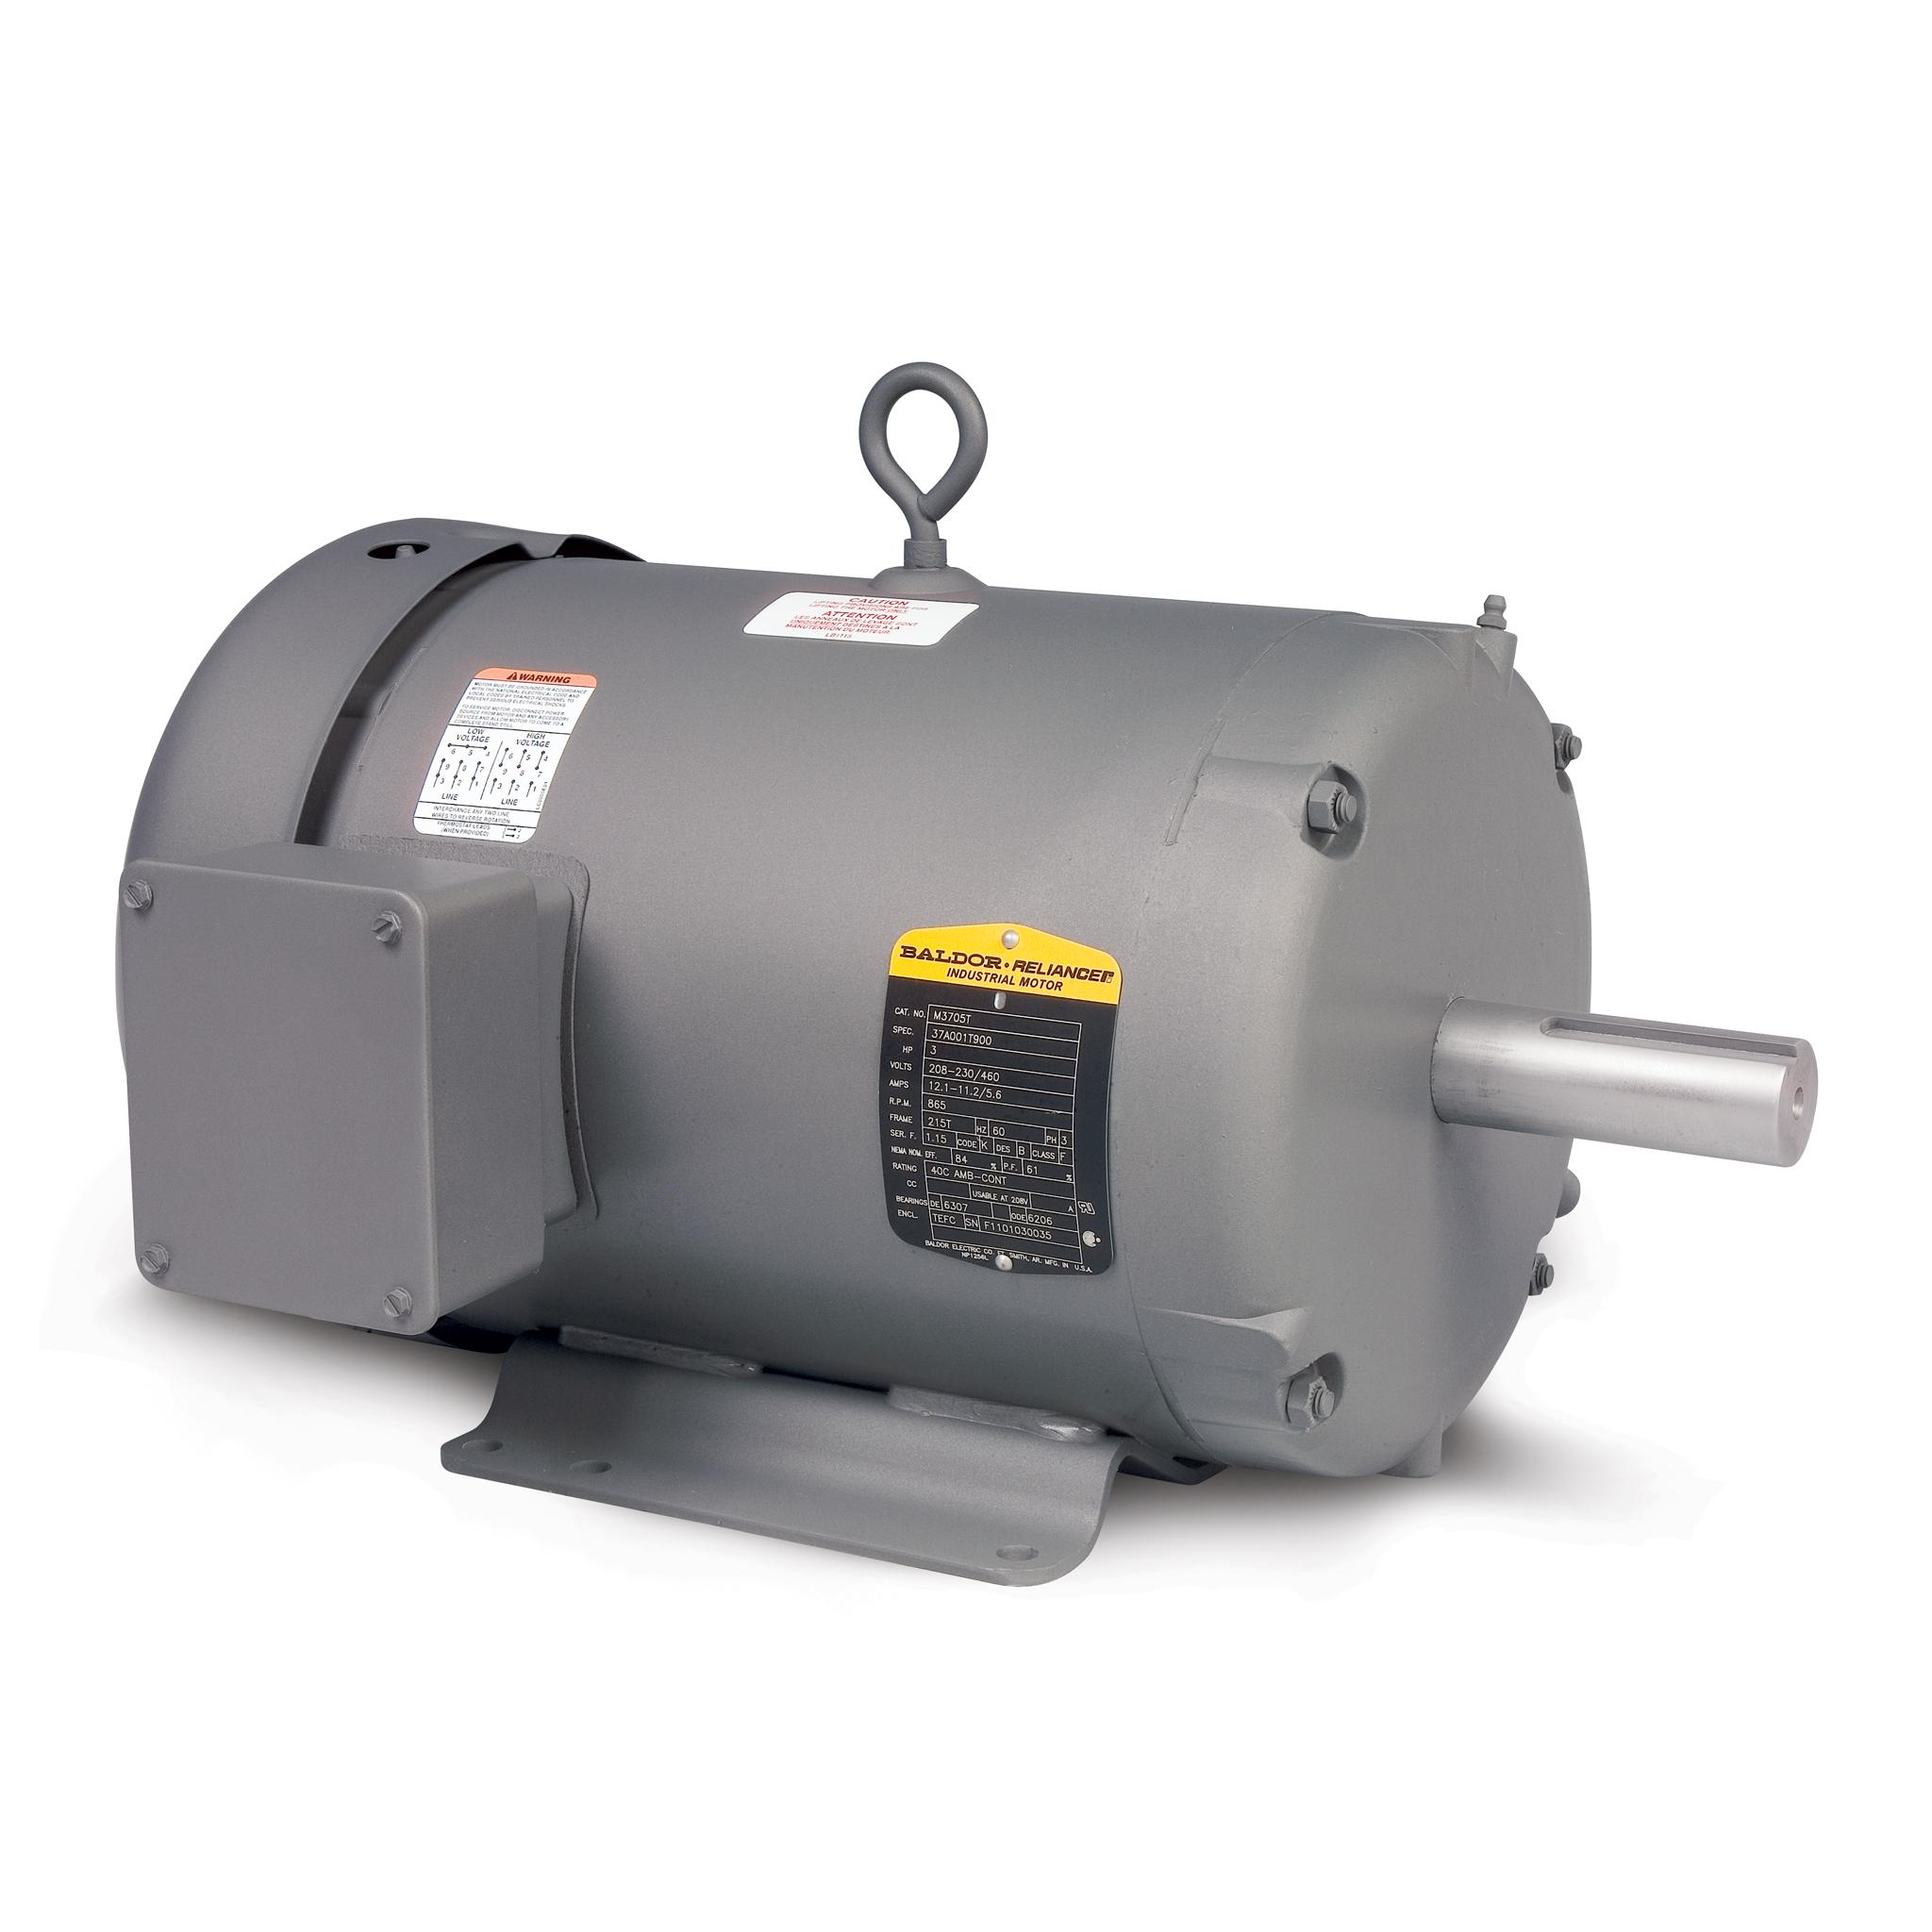 A000382 old baldor bench grinder 1 3hp wiring diagram diagram wiring  at mr168.co